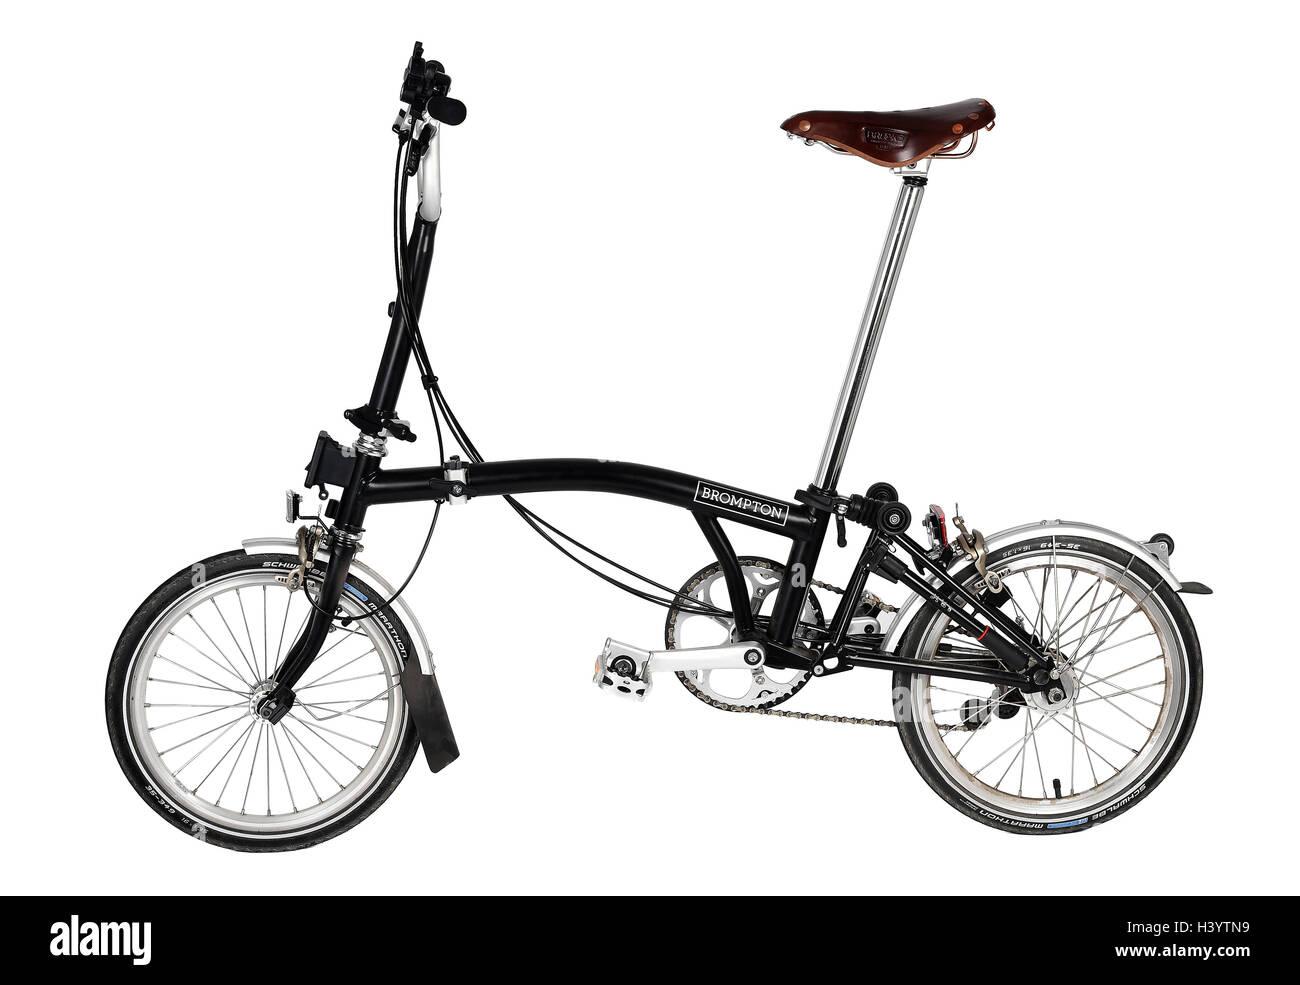 Brompton Folding Bike Bicycle Cycle Uk